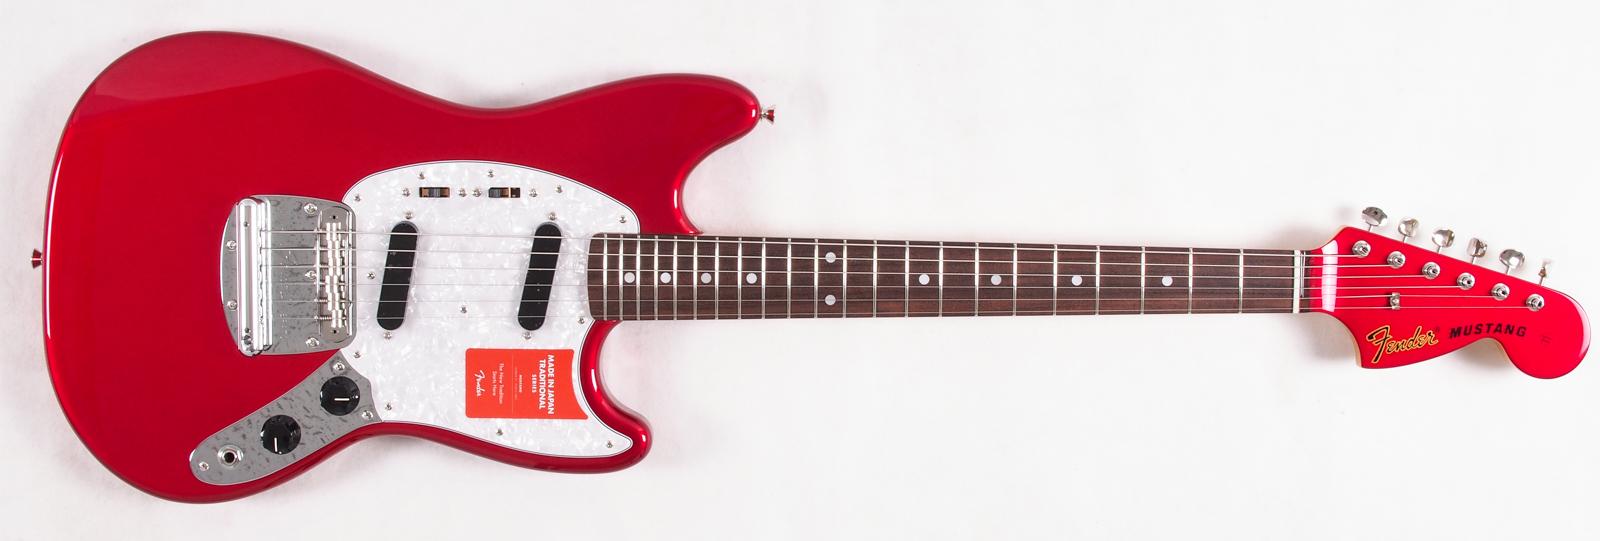 Fender FSR Japan Mustang Candy Apple Red